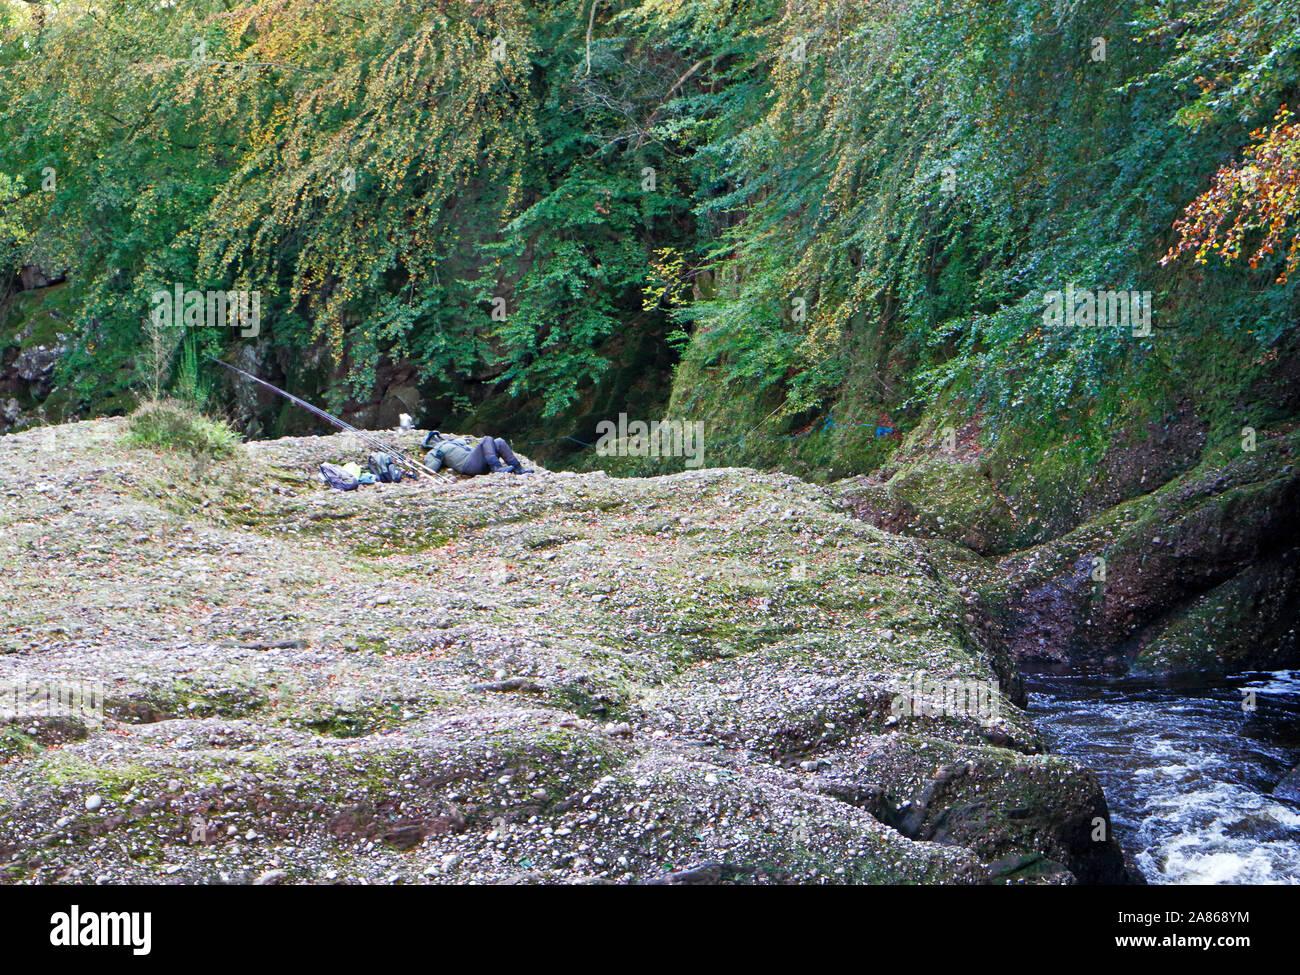 An salmon fishing angler resting on rocks by the River North Esk near Edzell, Angus, Scotland, United Kingdom, Europe. Stock Photo